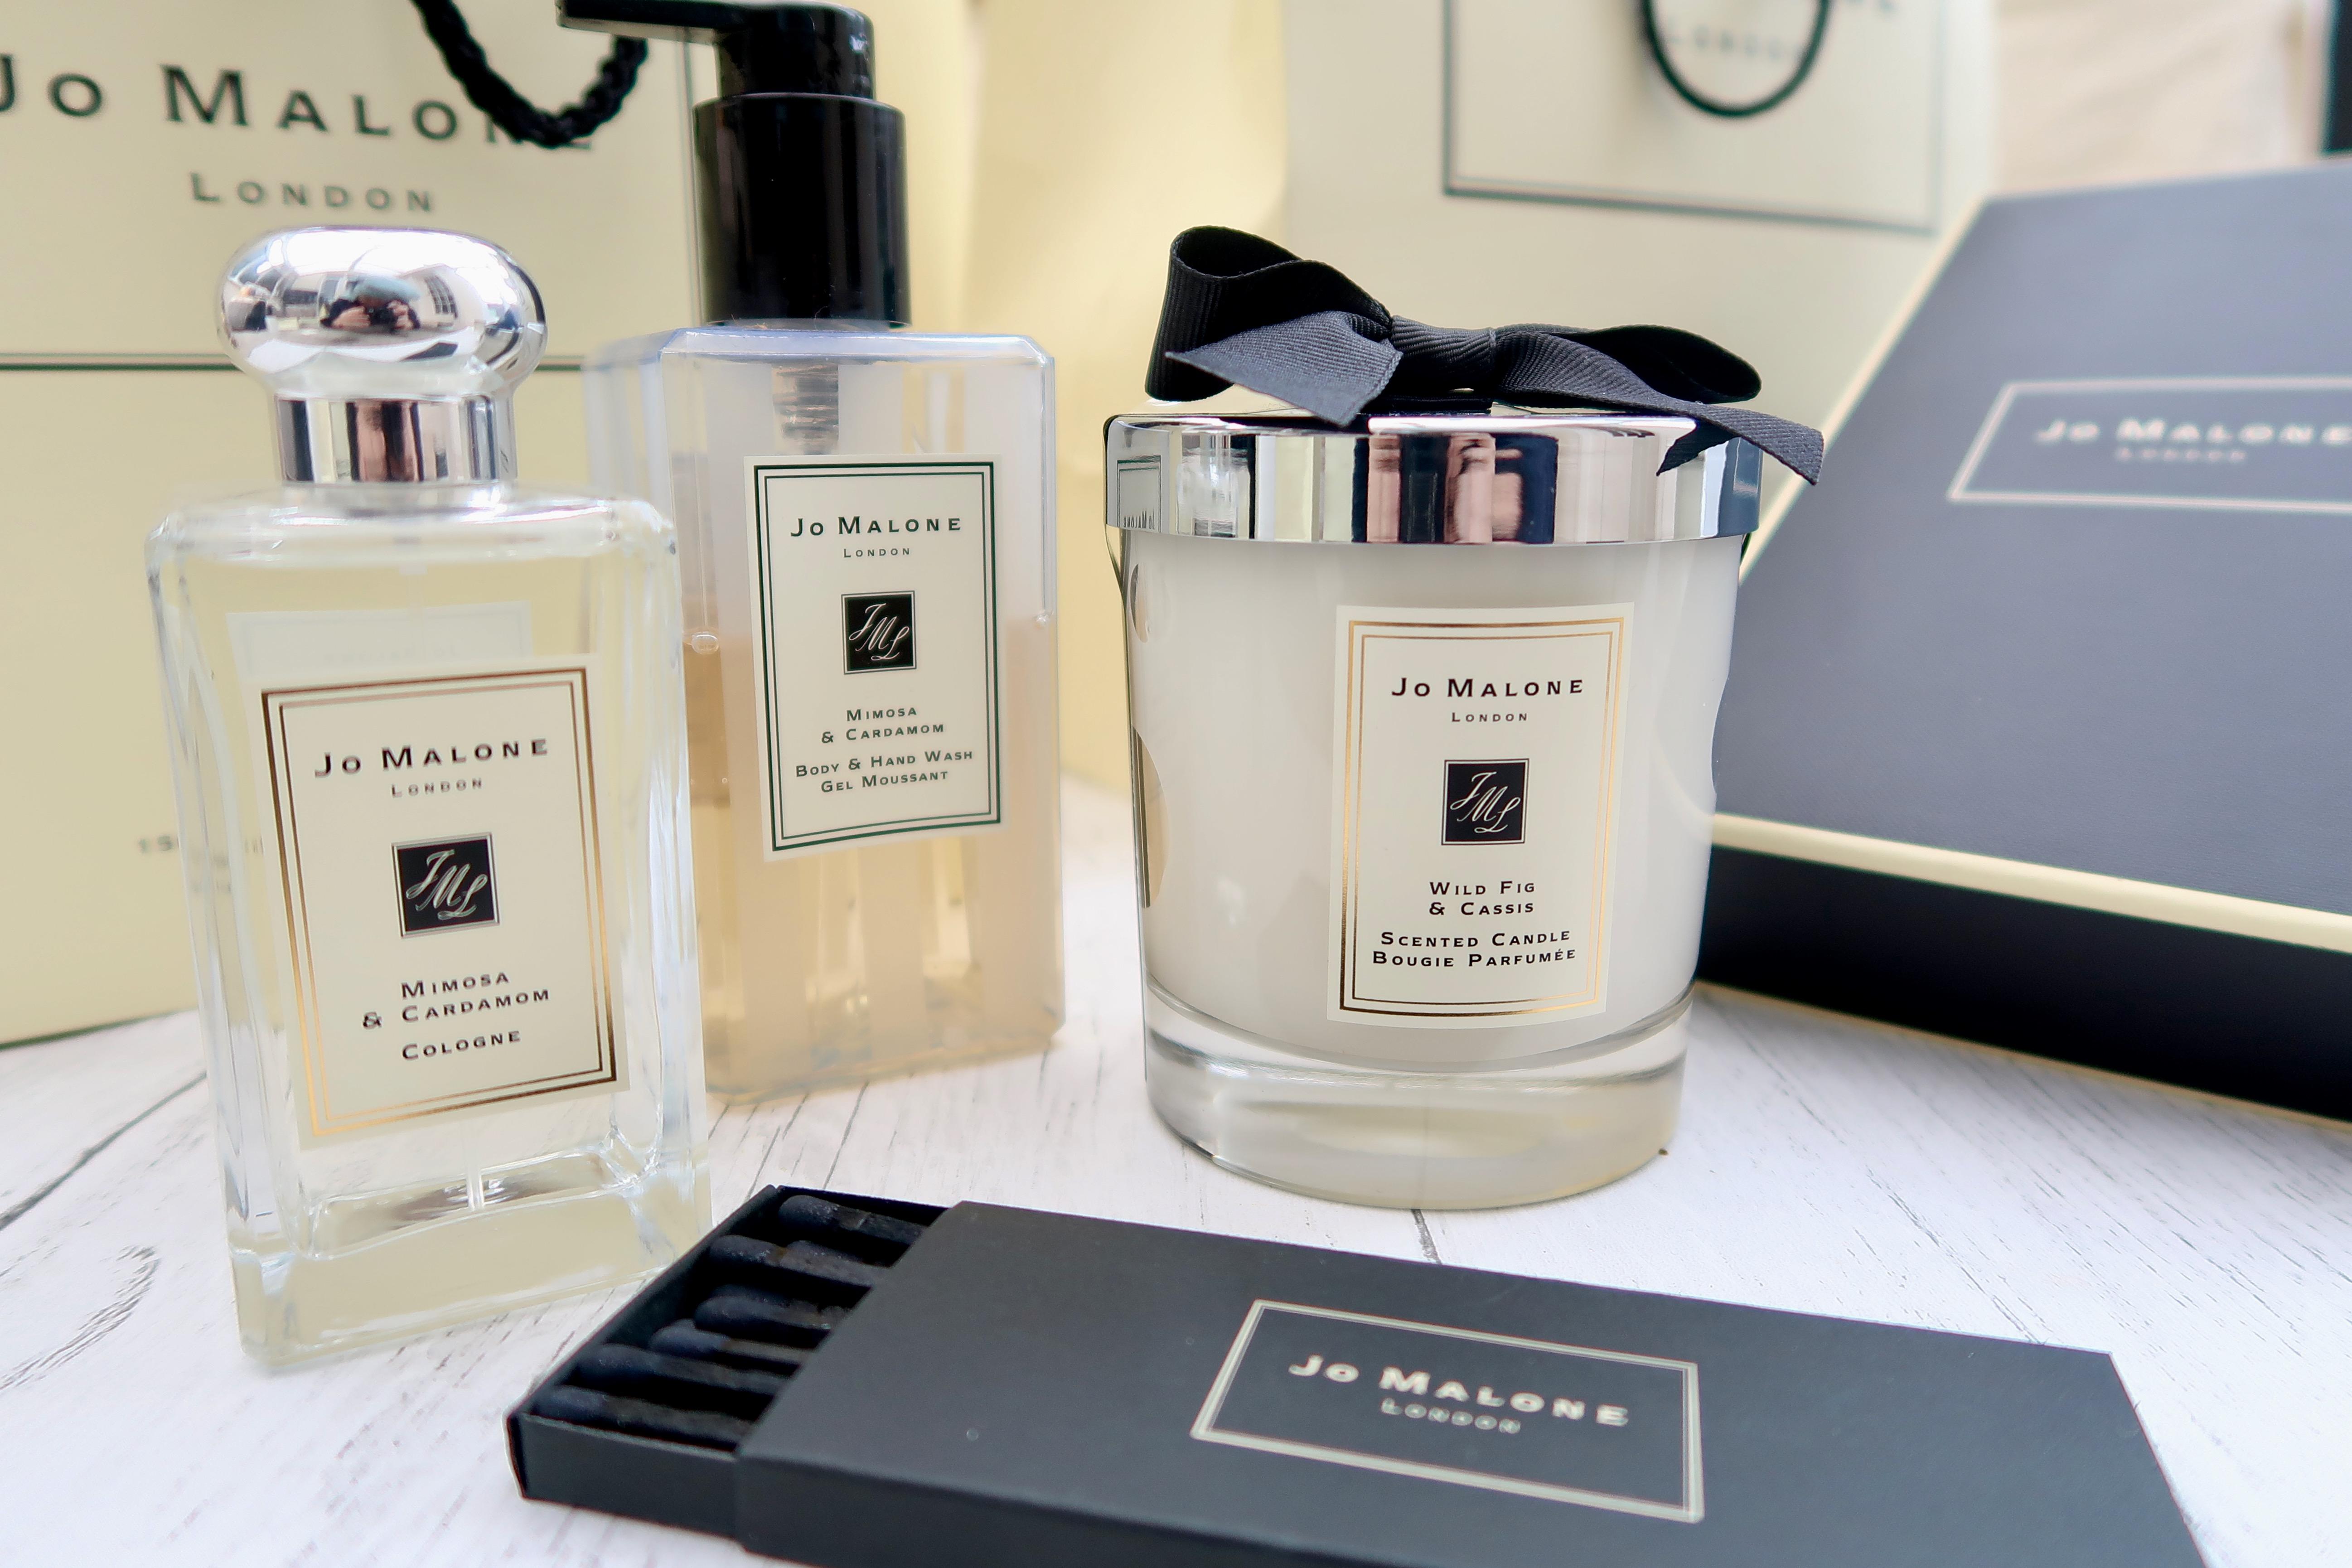 Aldi Luxury Advent Calendar | Jo Malone vs Aldi Number | Splurge vs Save | Honest Review of the new Aldi bath & body range | Elle Blonde Luxury Lifestyle Destination Blog